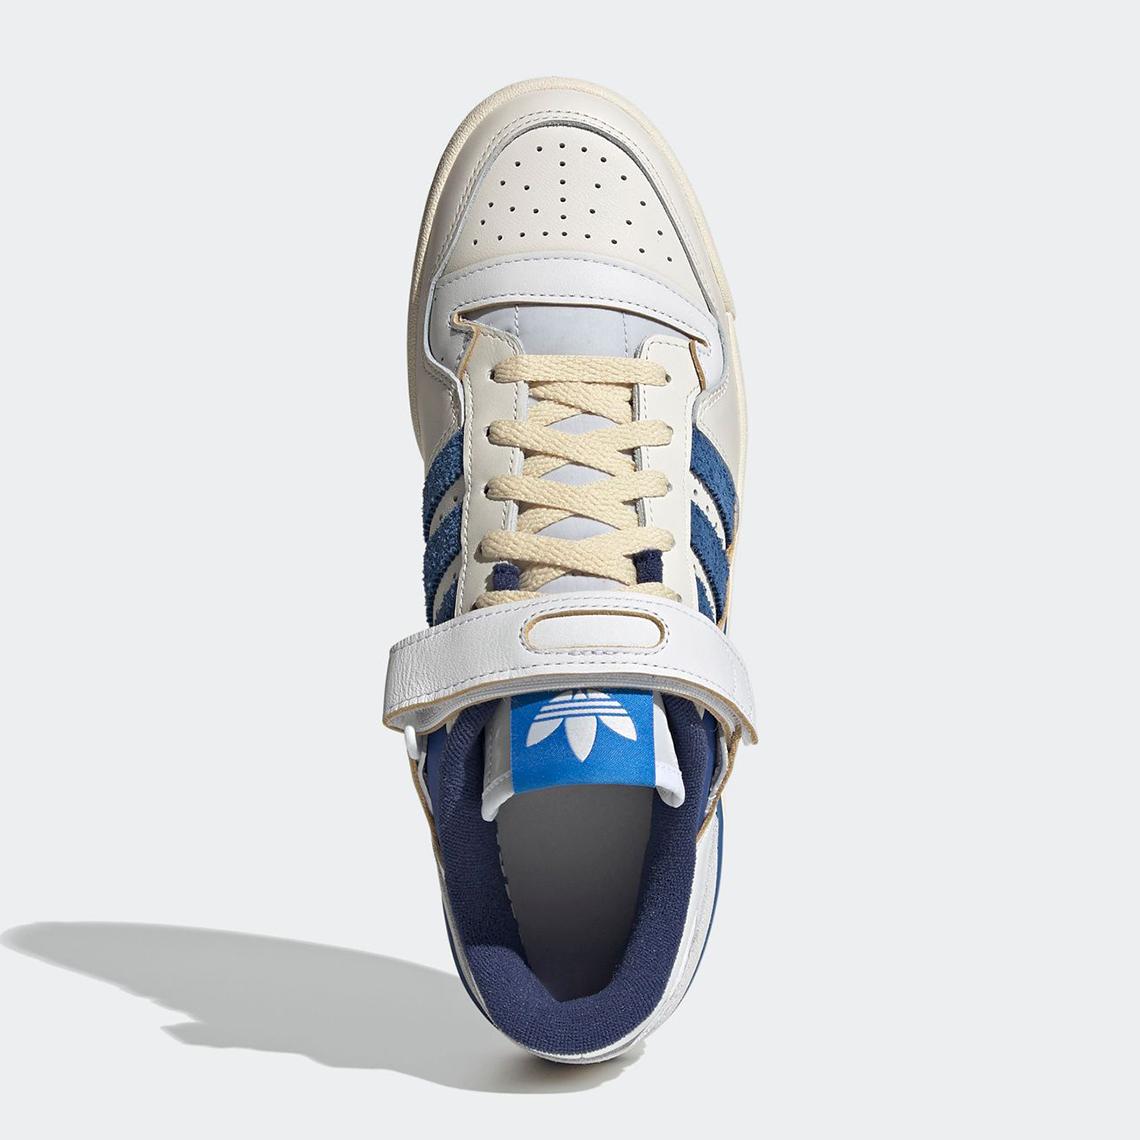 adidas Forum 84 Low OG ''Bright Blue'' - S23764